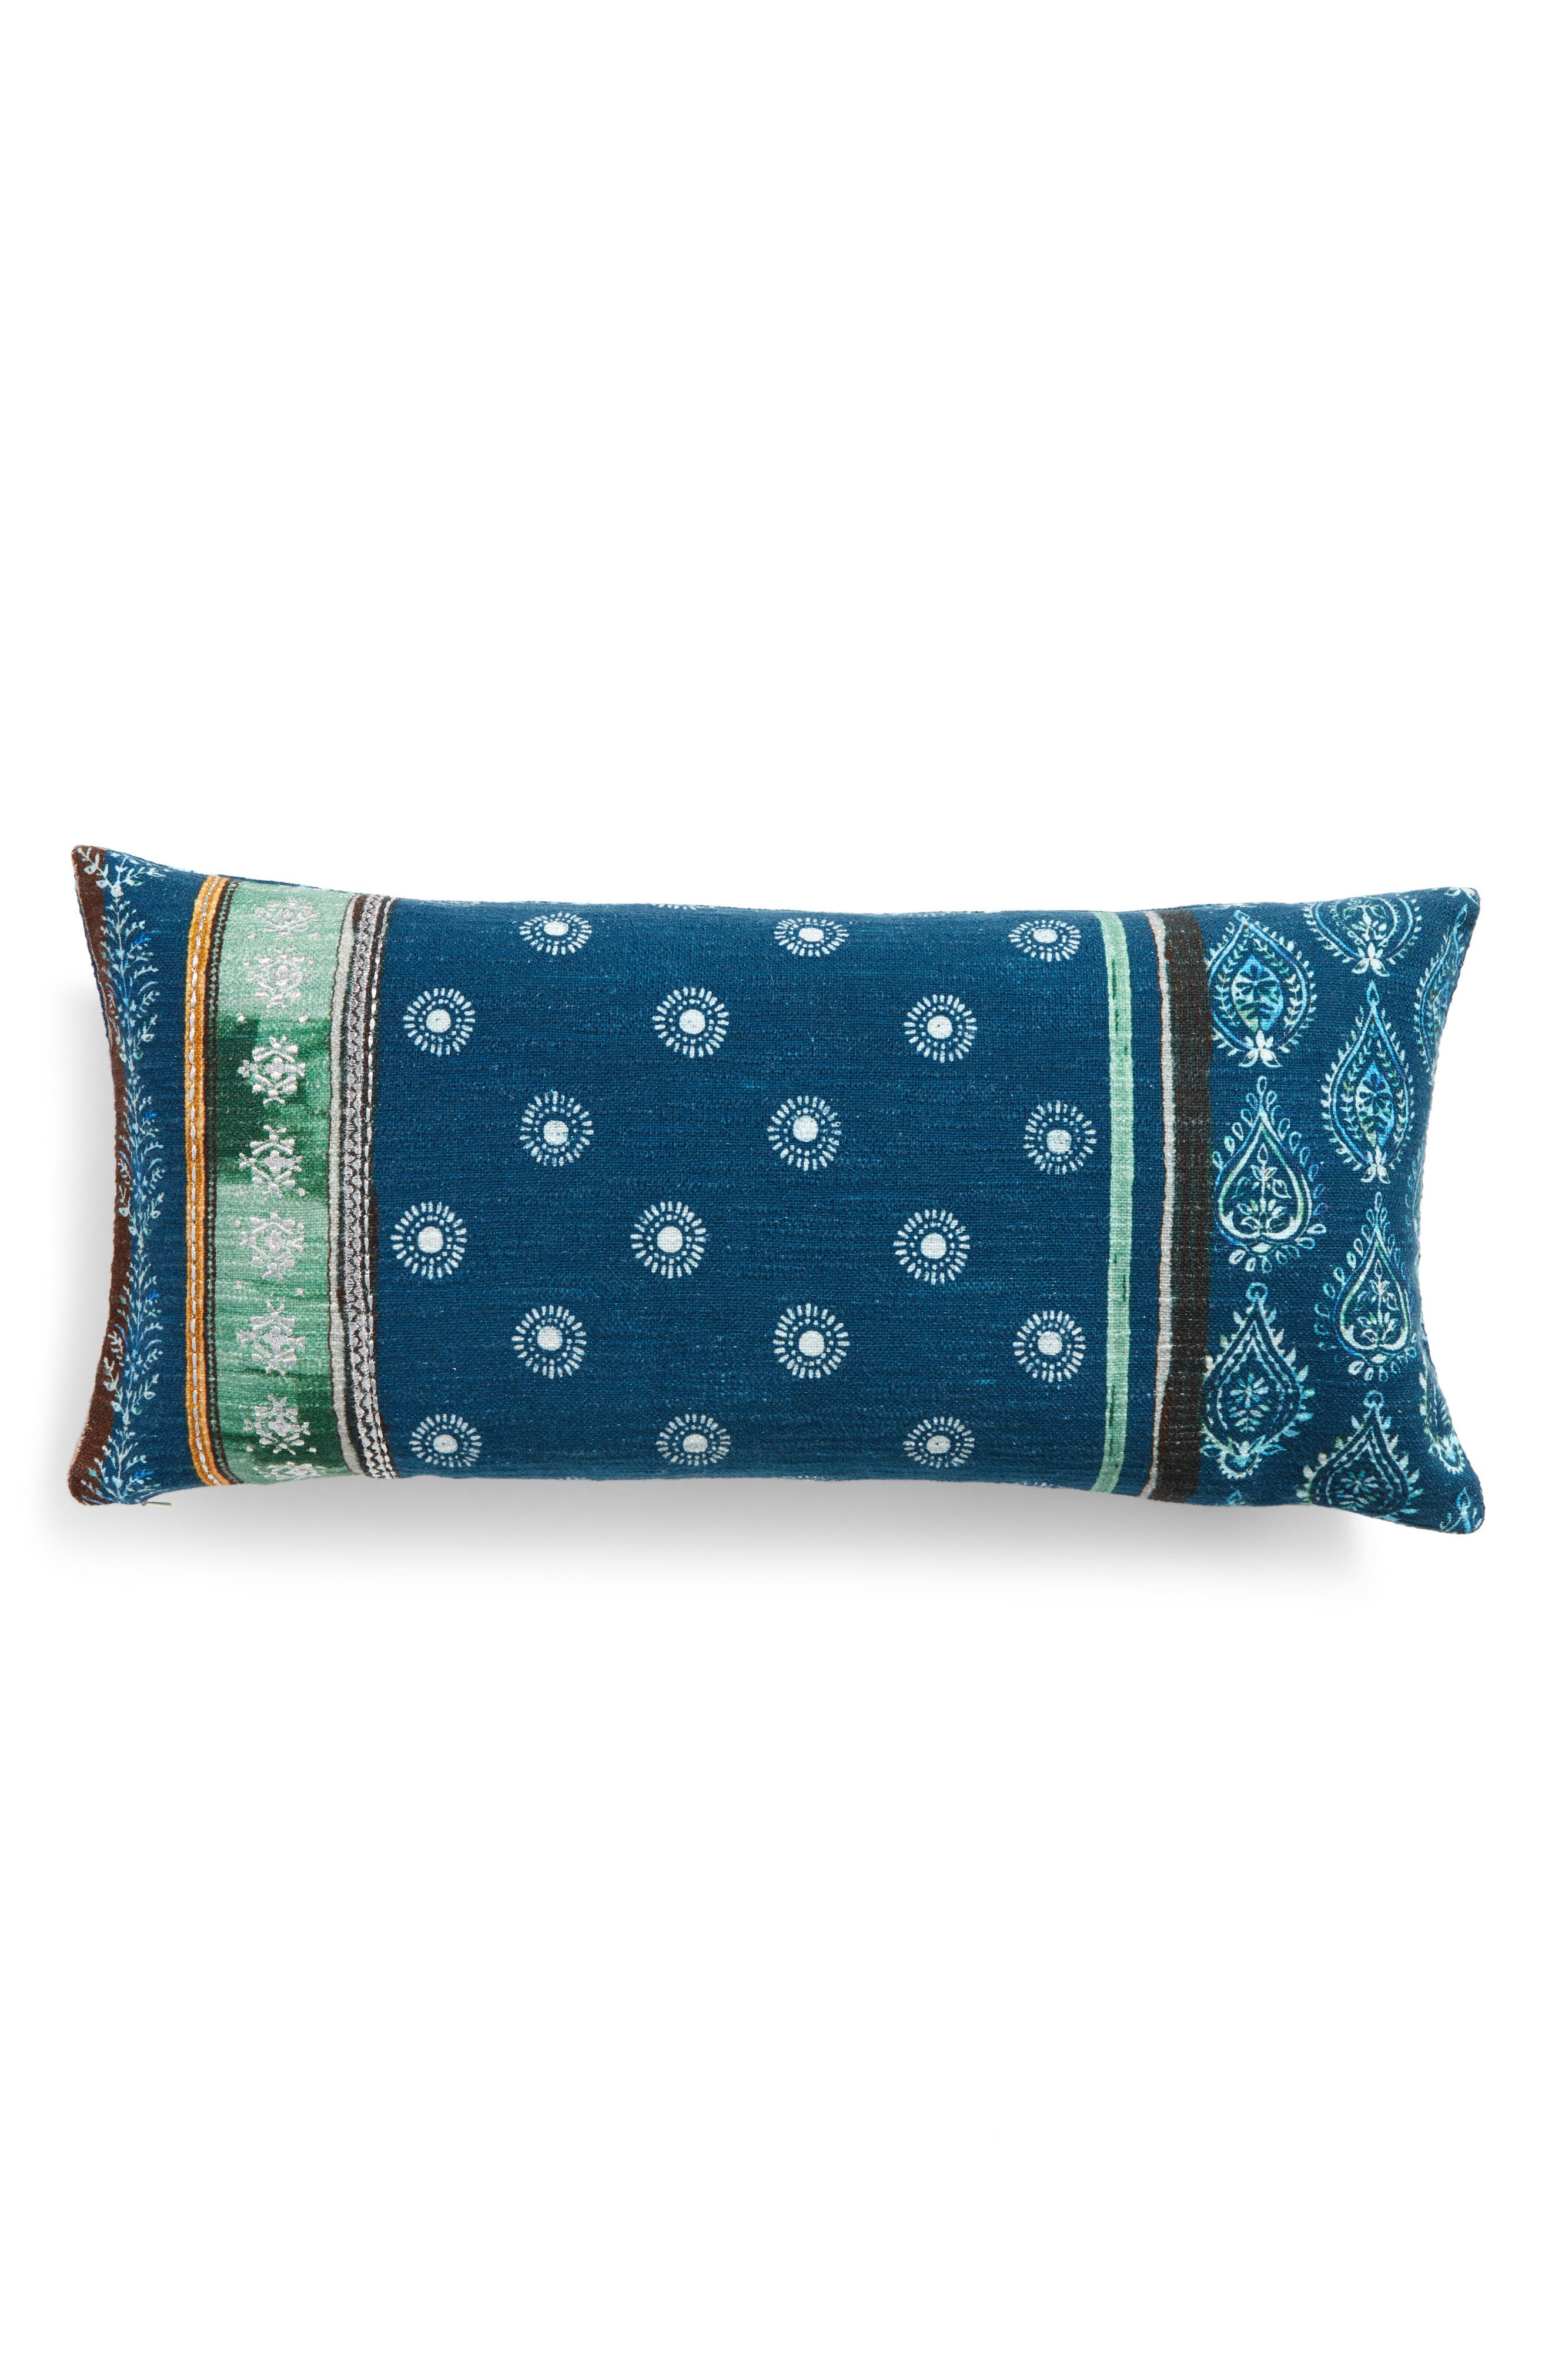 Main Image - Nordstrom at Home Block Print Pillow